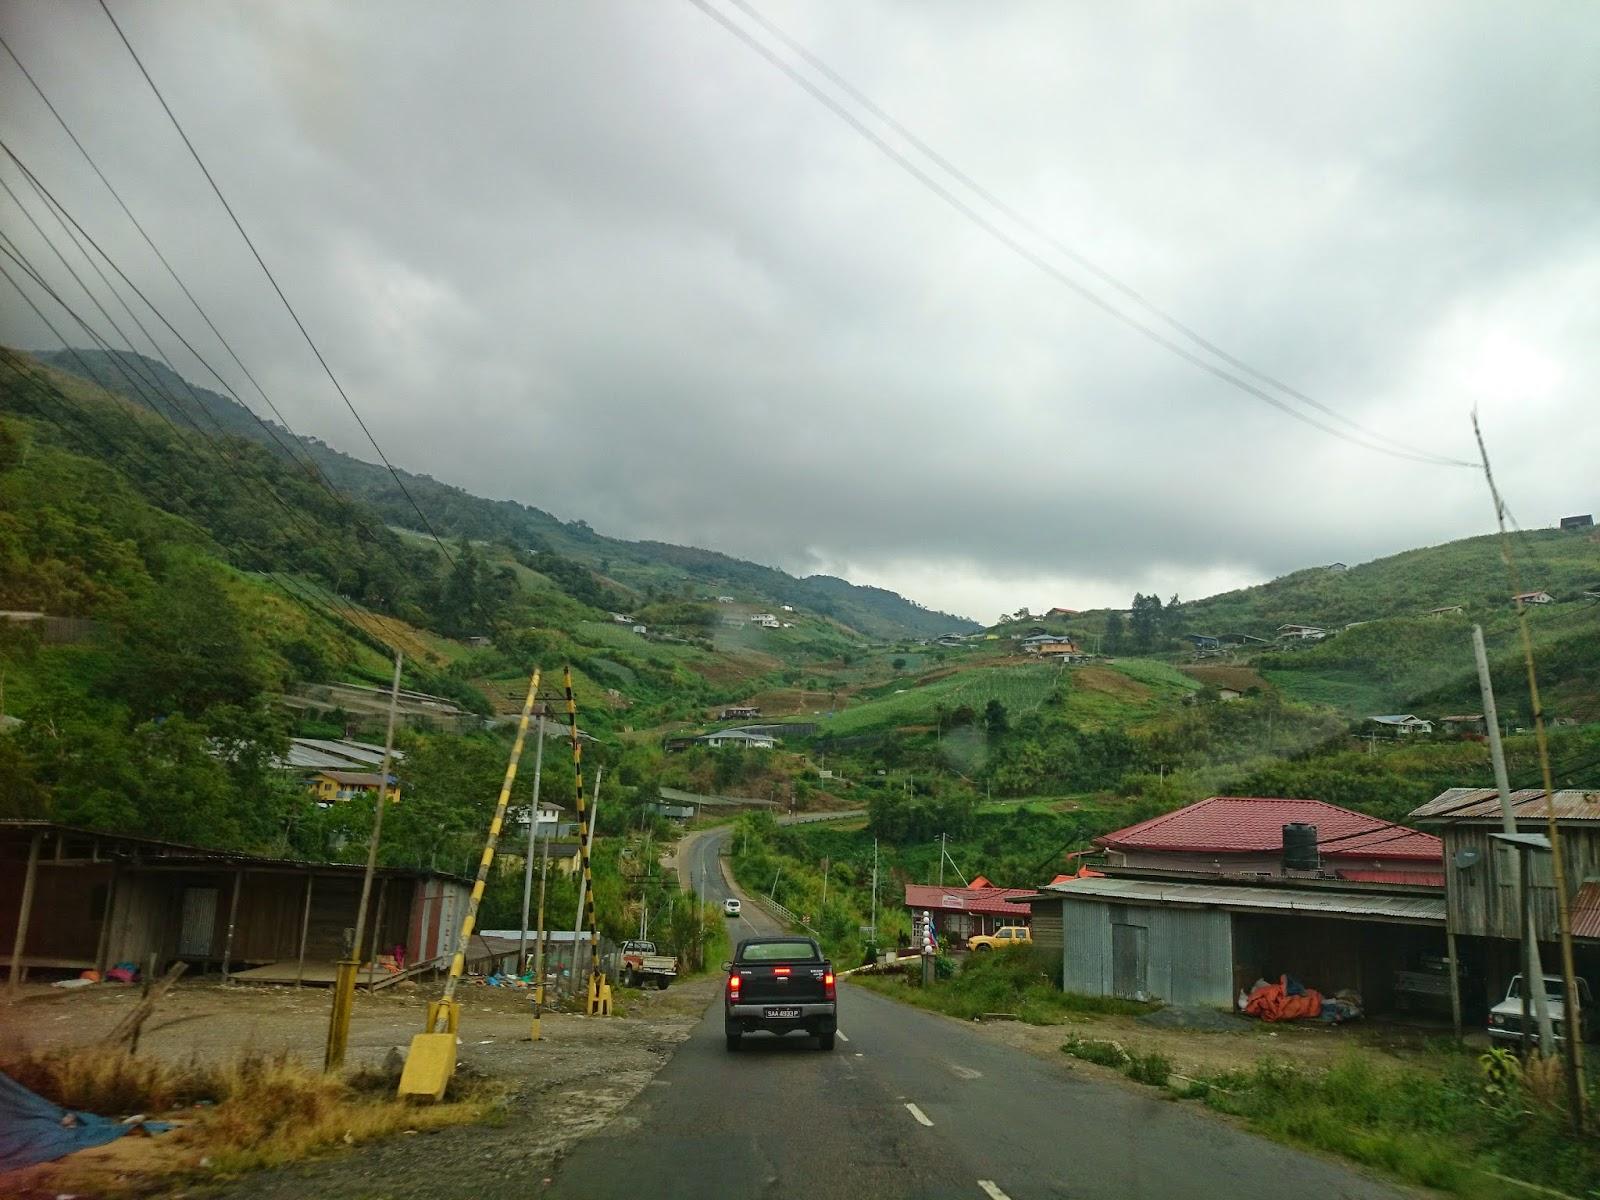 Cuti-cuti Malaysia : Kinabalu View Chalet, Mesilau Kundasang Sabah